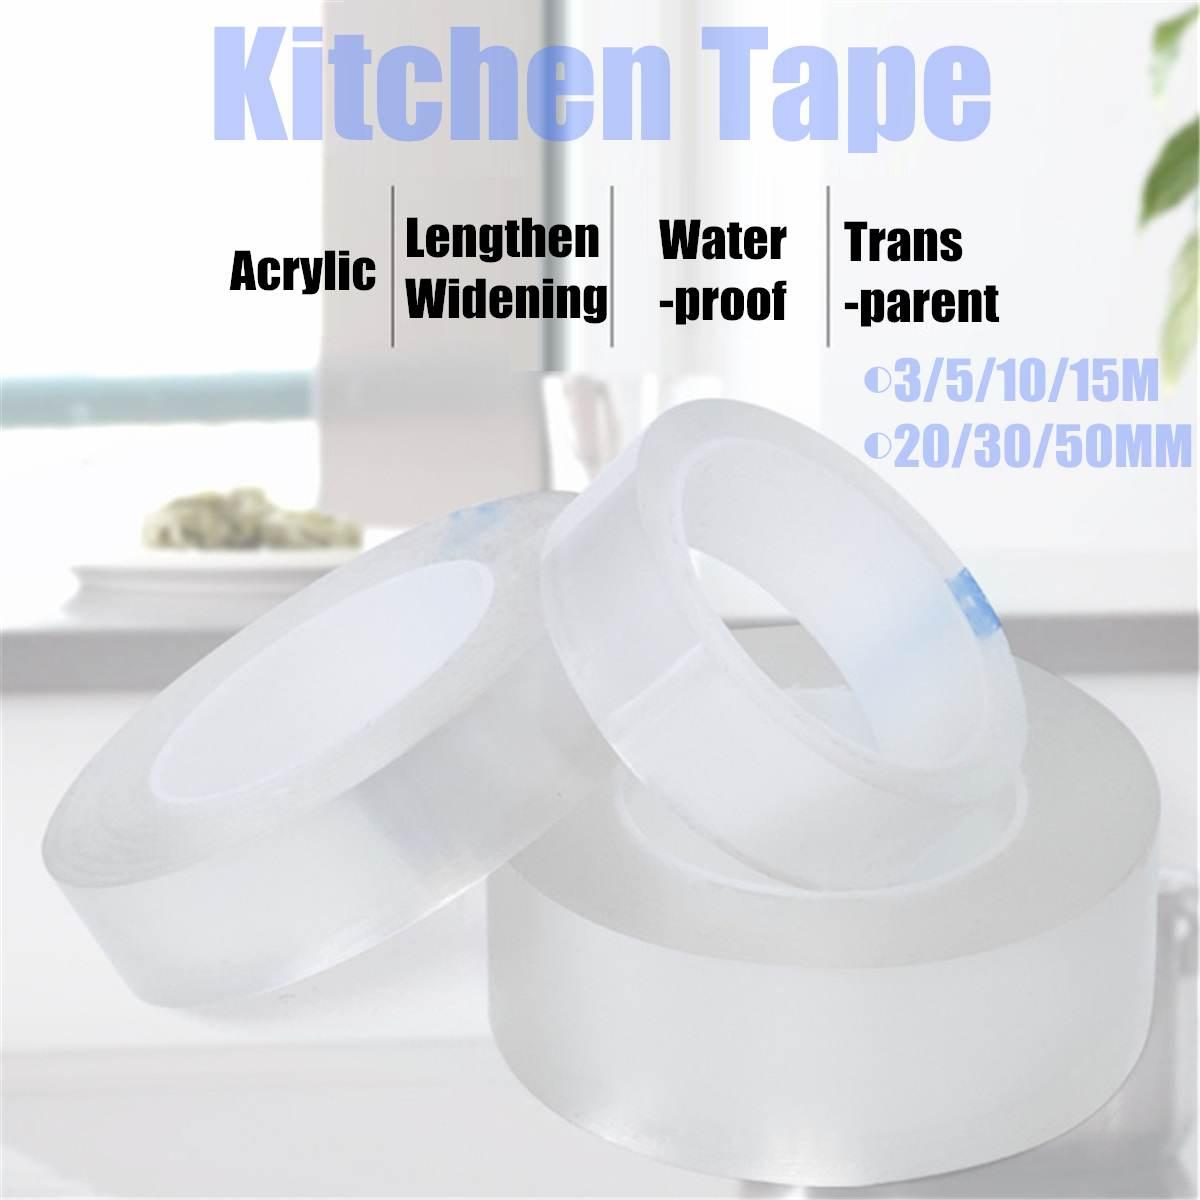 Self Adhesive Kitchen Tape Bathroom Wall Sealing Tape Waterproof Mildew Proof Toilet Wall Corner Line Sink Sealing Stickers